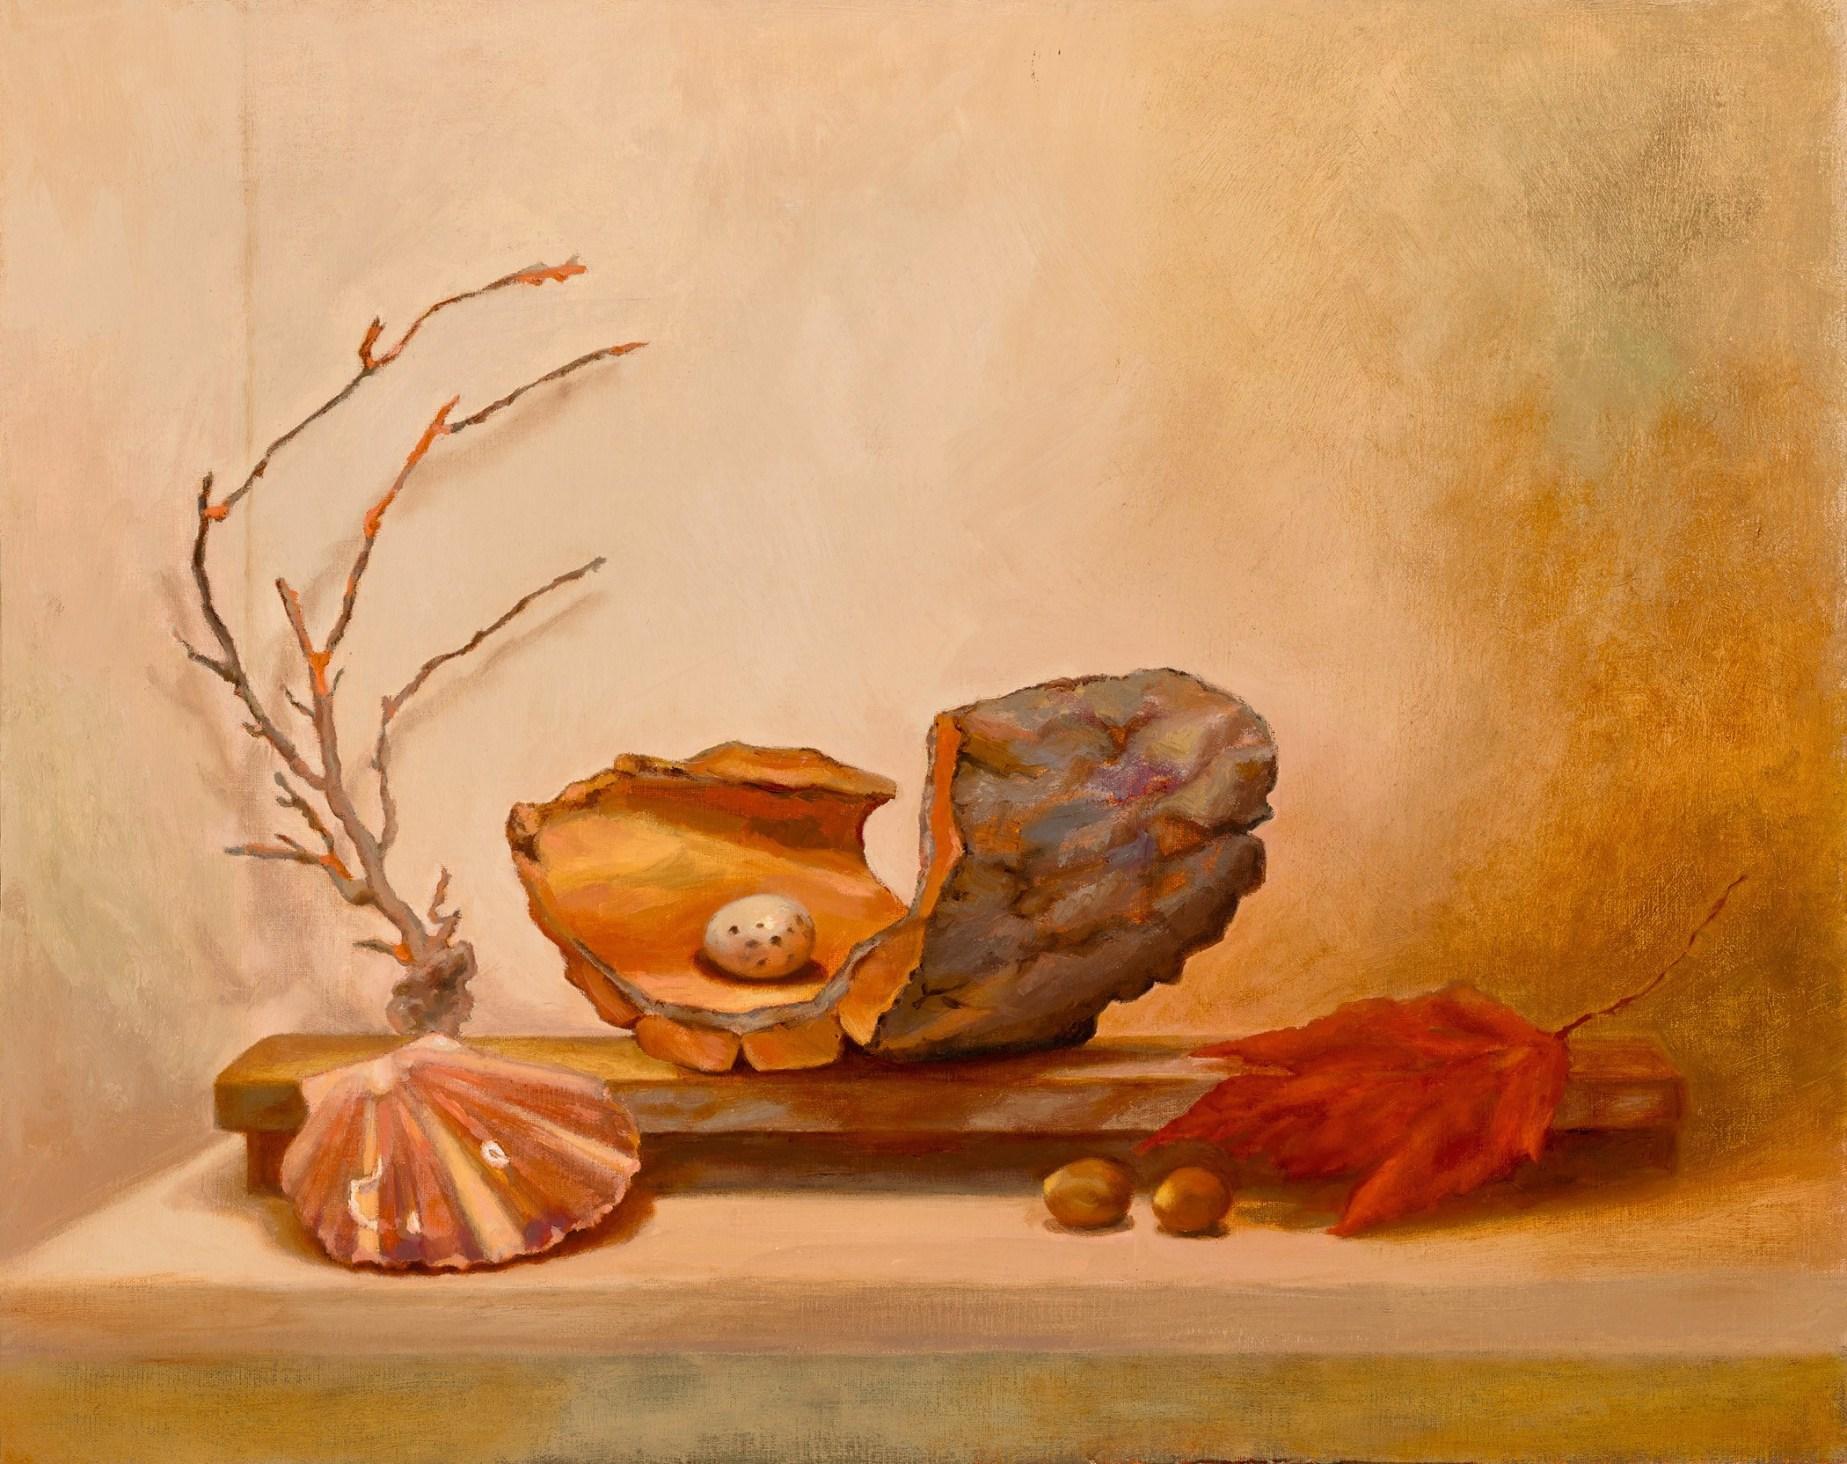 Little Altars: Madrona Altar, 16″ x 20″ oil on linen on aluminum, SOLD